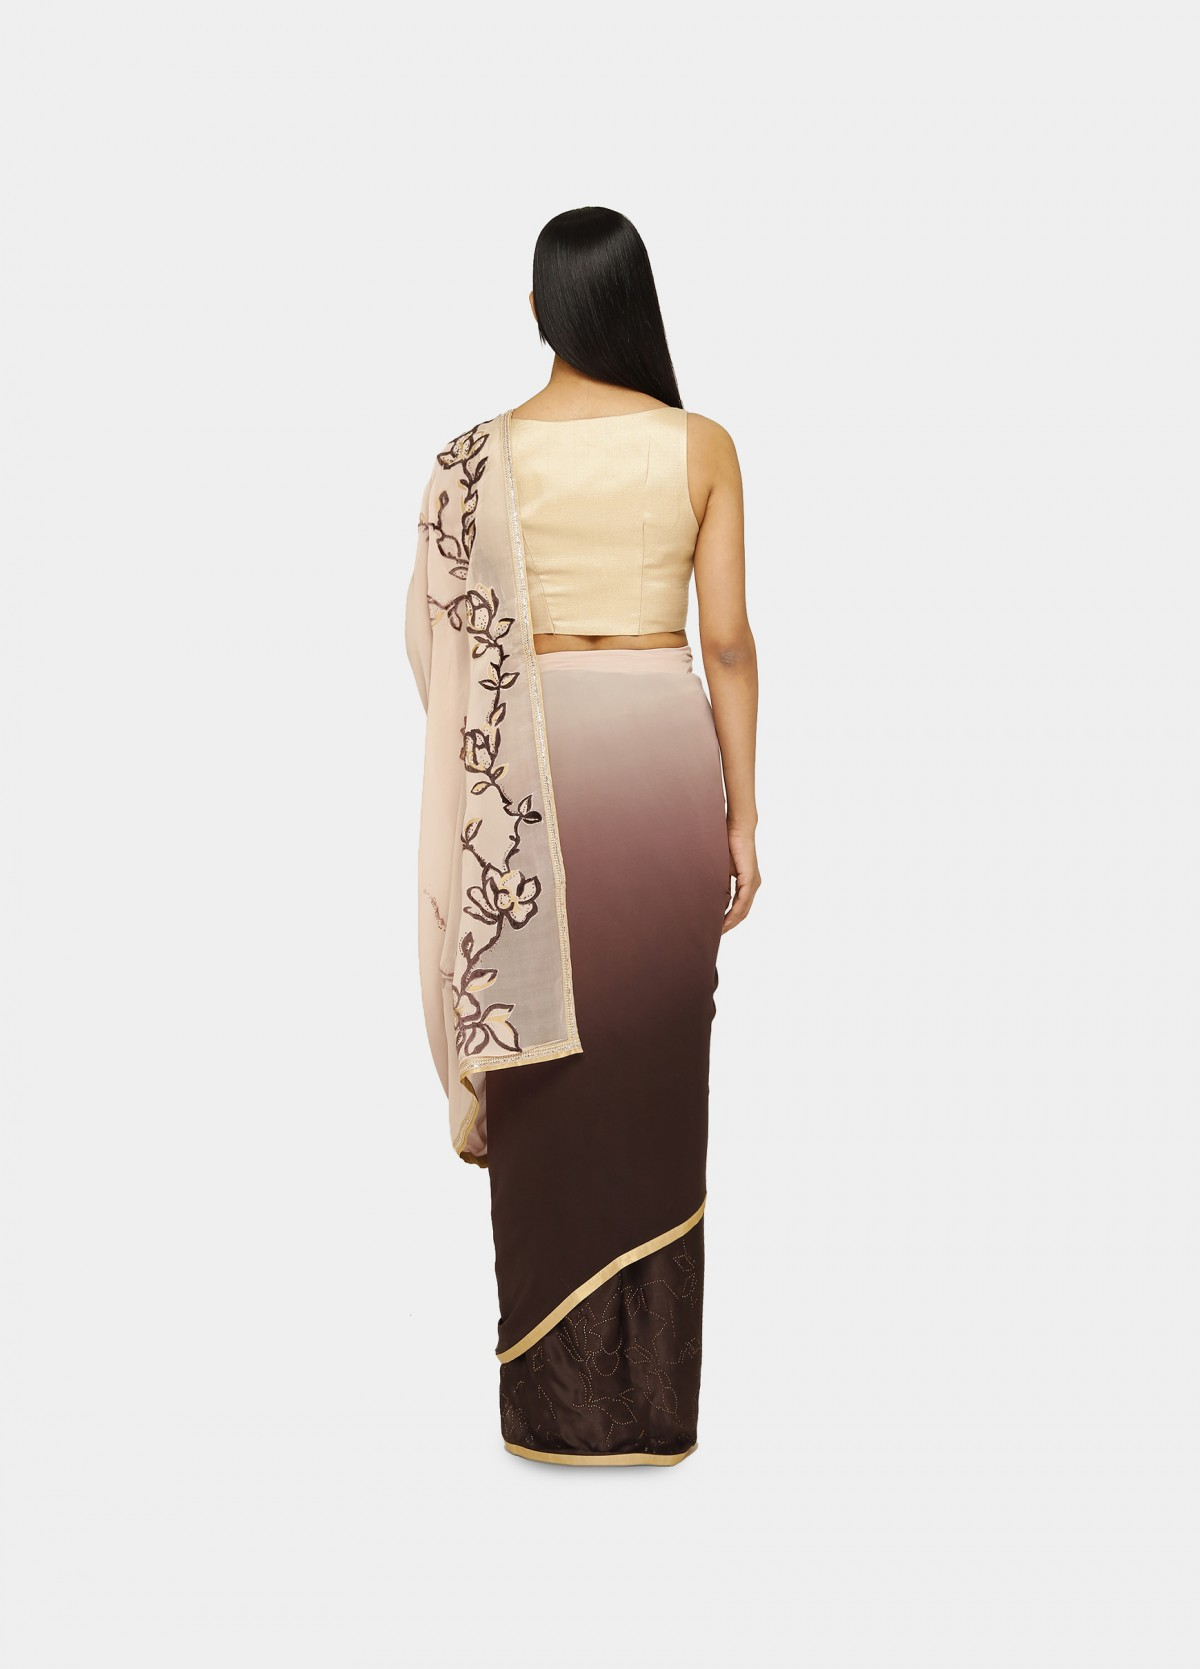 The Radiant Bloom Sari